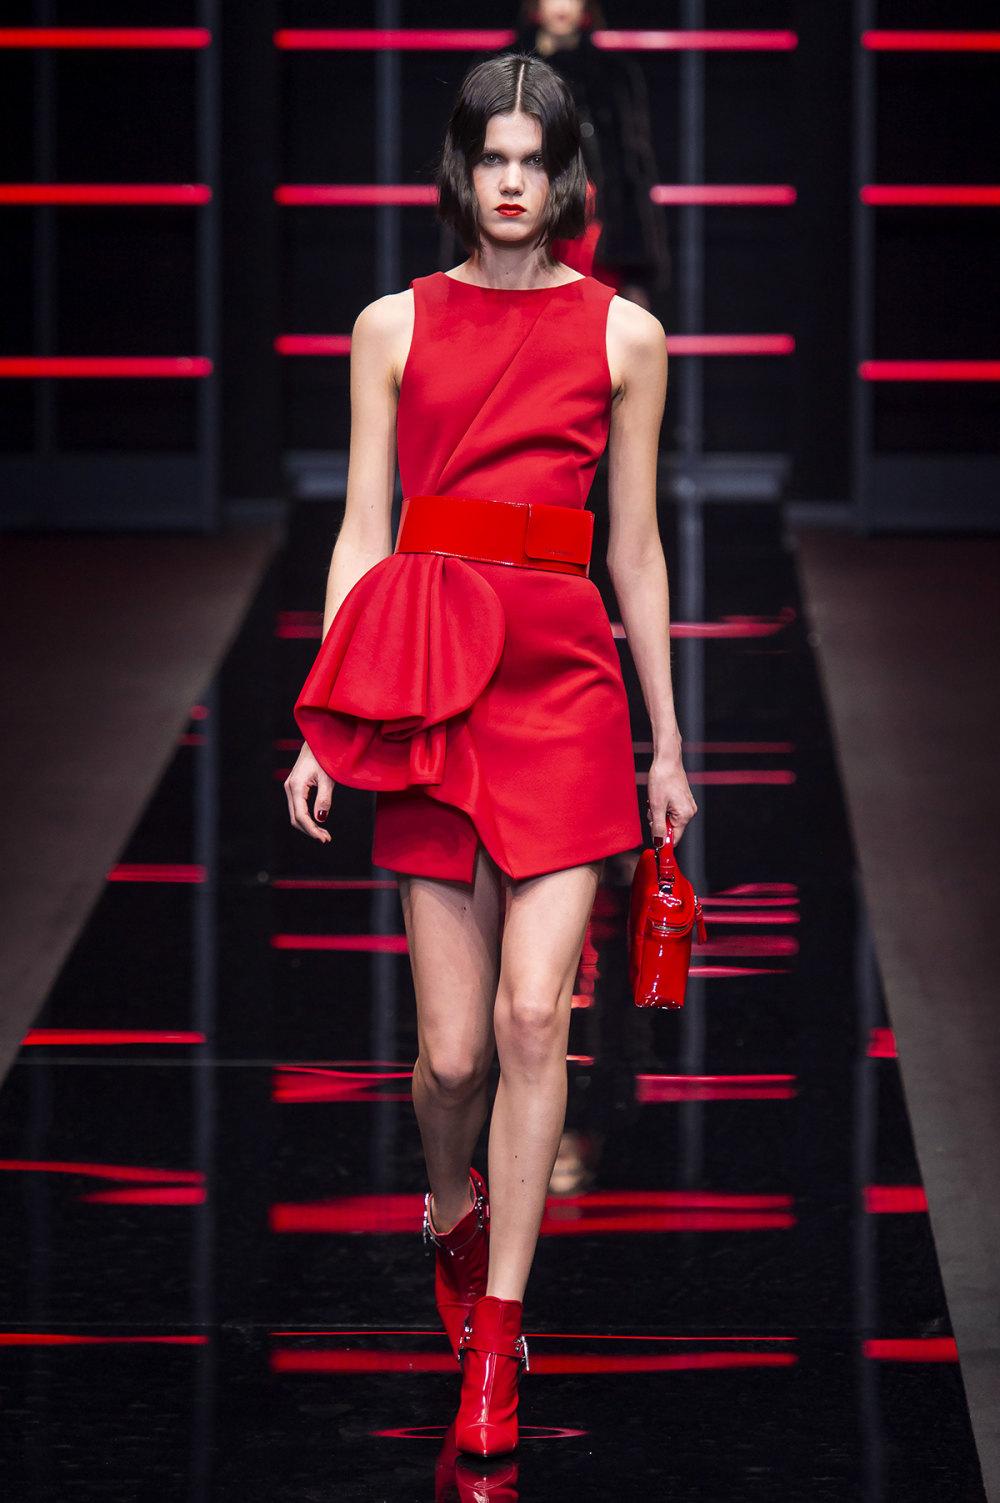 Emporio Armani时装系列畅的裤子带有柔滑裙子的鸡尾酒礼服-54.jpg